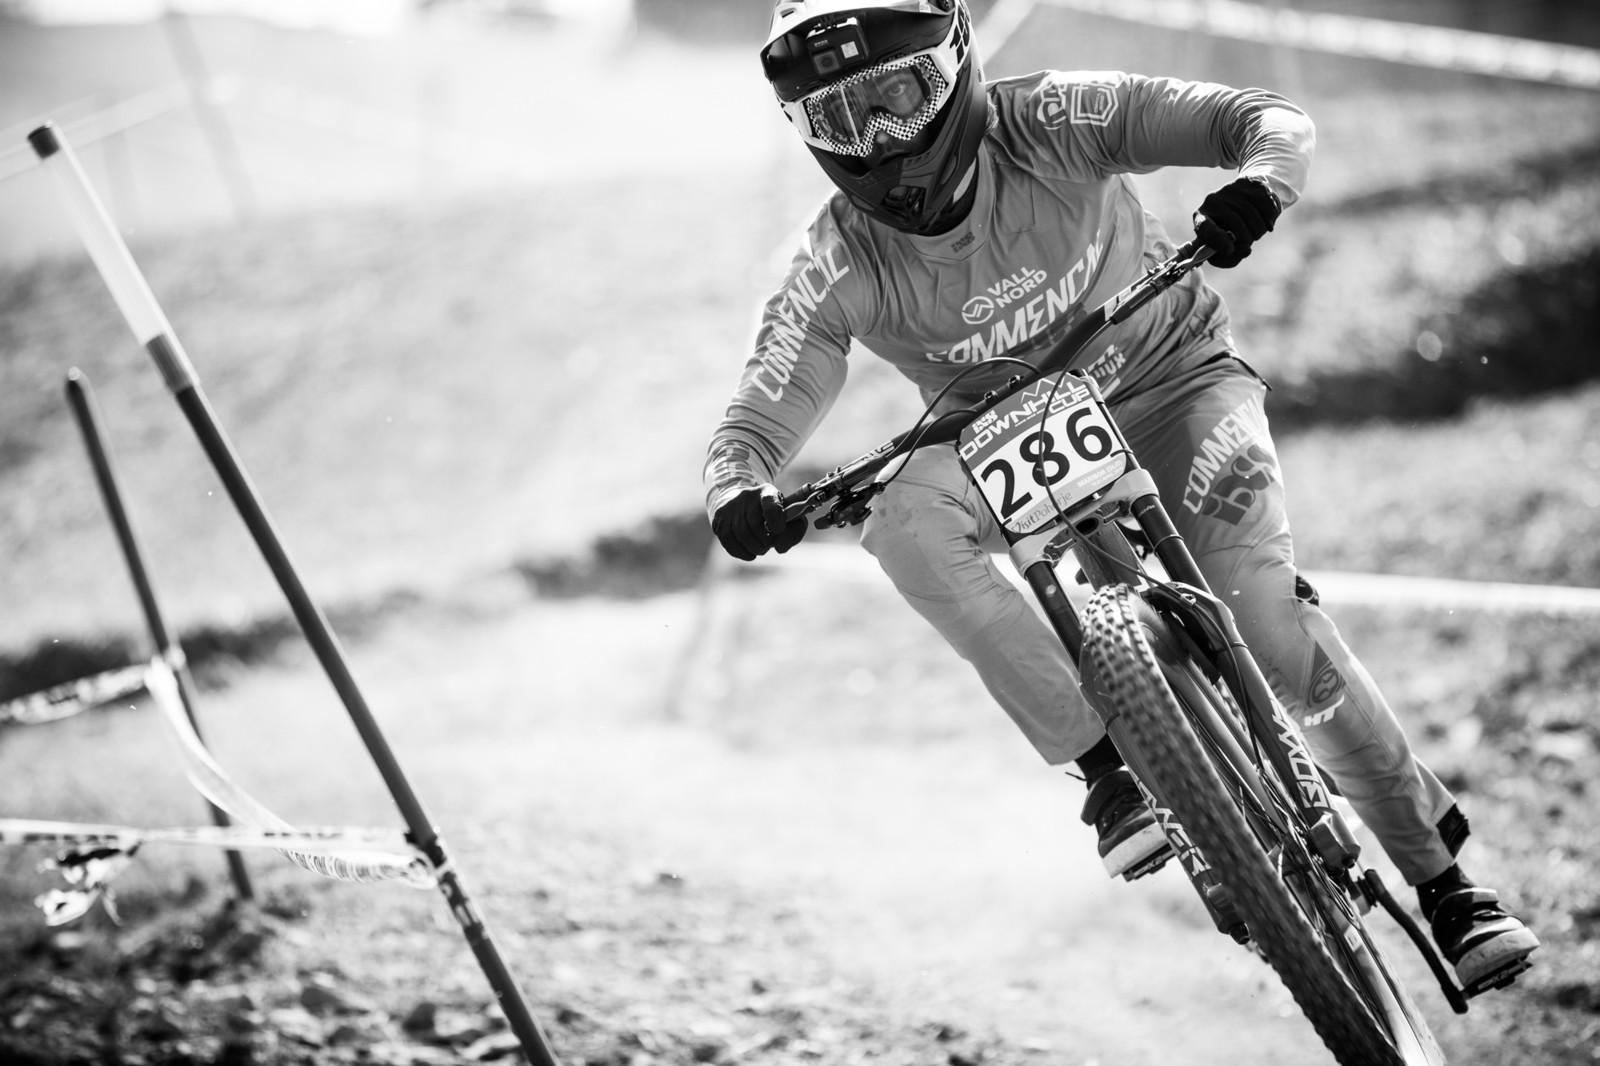 Thibaut Daprela, Junior Men's Winner - iXS Downhill Cup Maribor - Race Gallery - Mountain Biking Pictures - Vital MTB